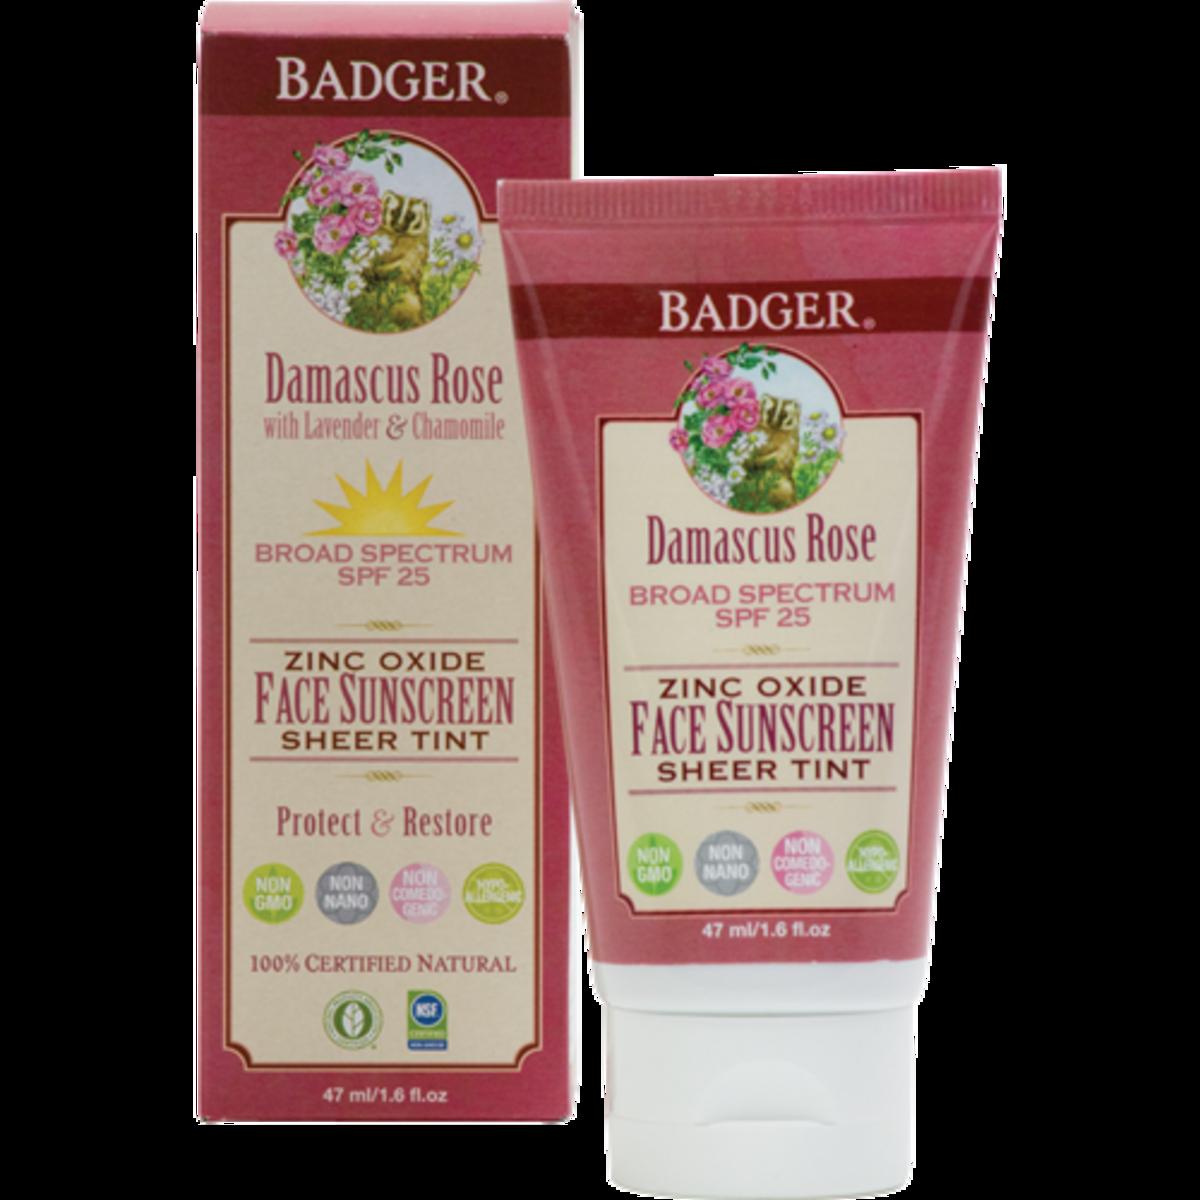 Badger Damascus Rose SPF 25 Sheer Tint Face Sunscreen Lotion